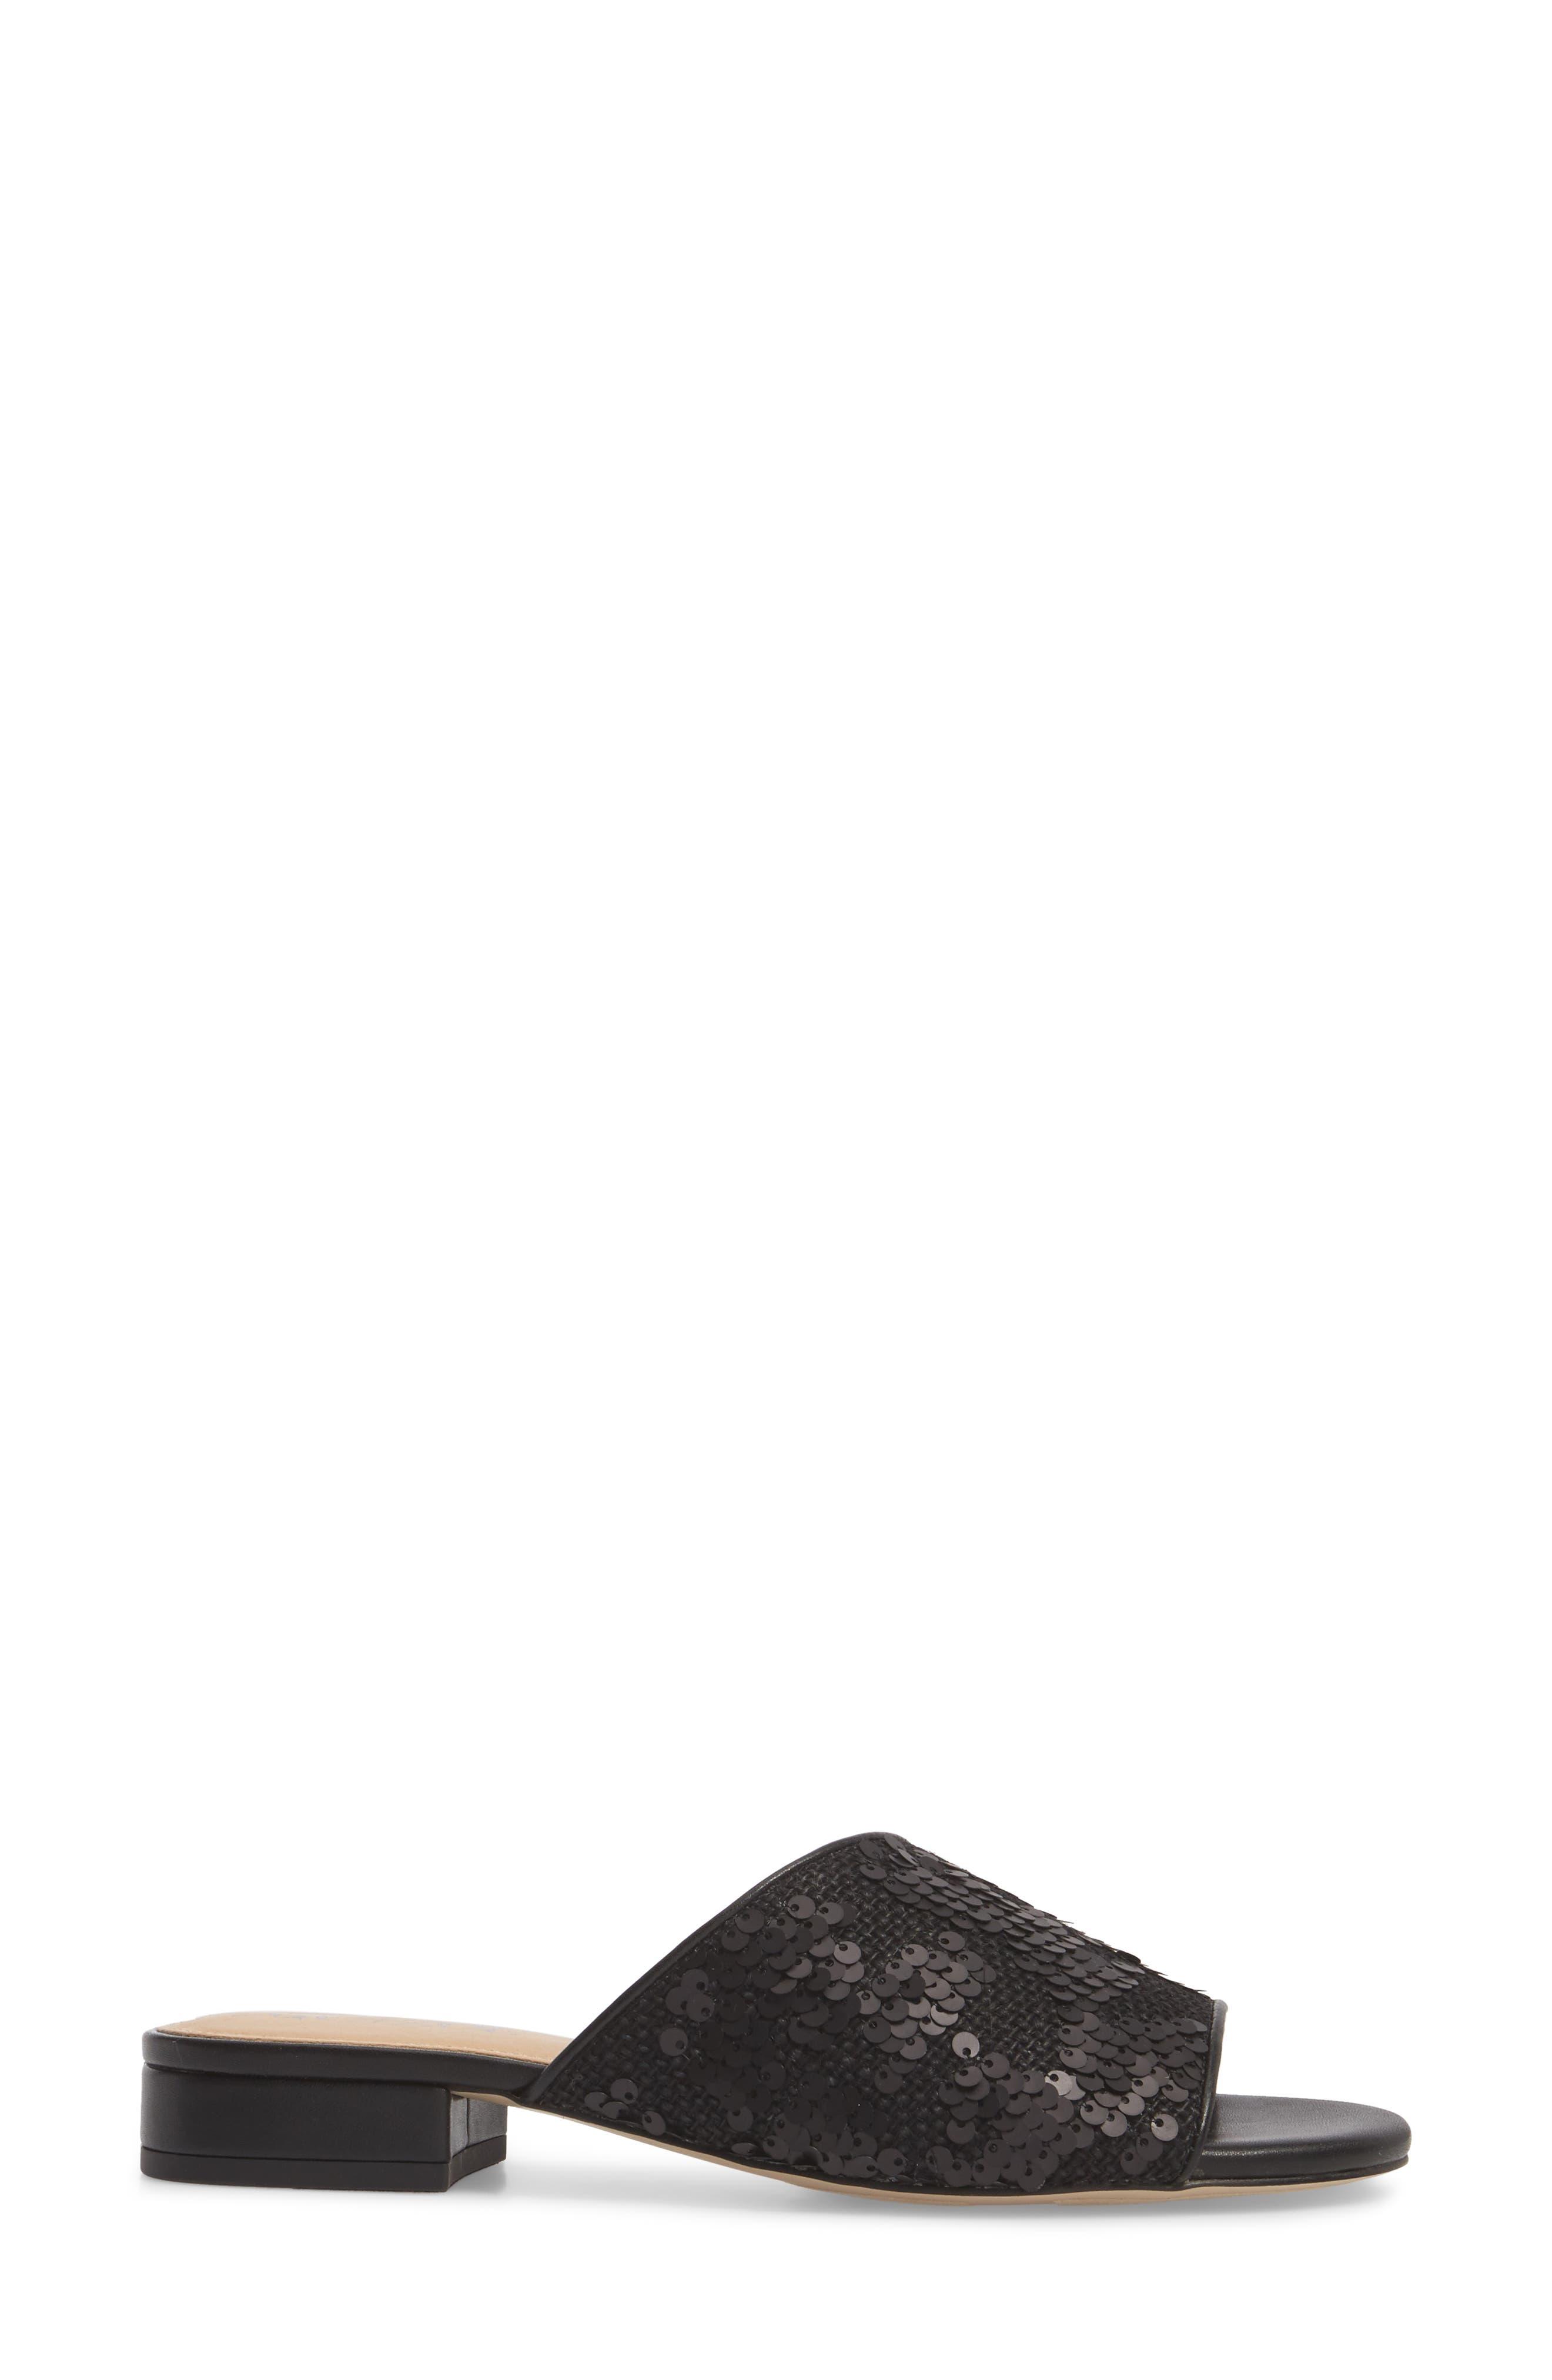 Stella Slide Sandal,                             Alternate thumbnail 3, color,                             Black Sequin Fabric